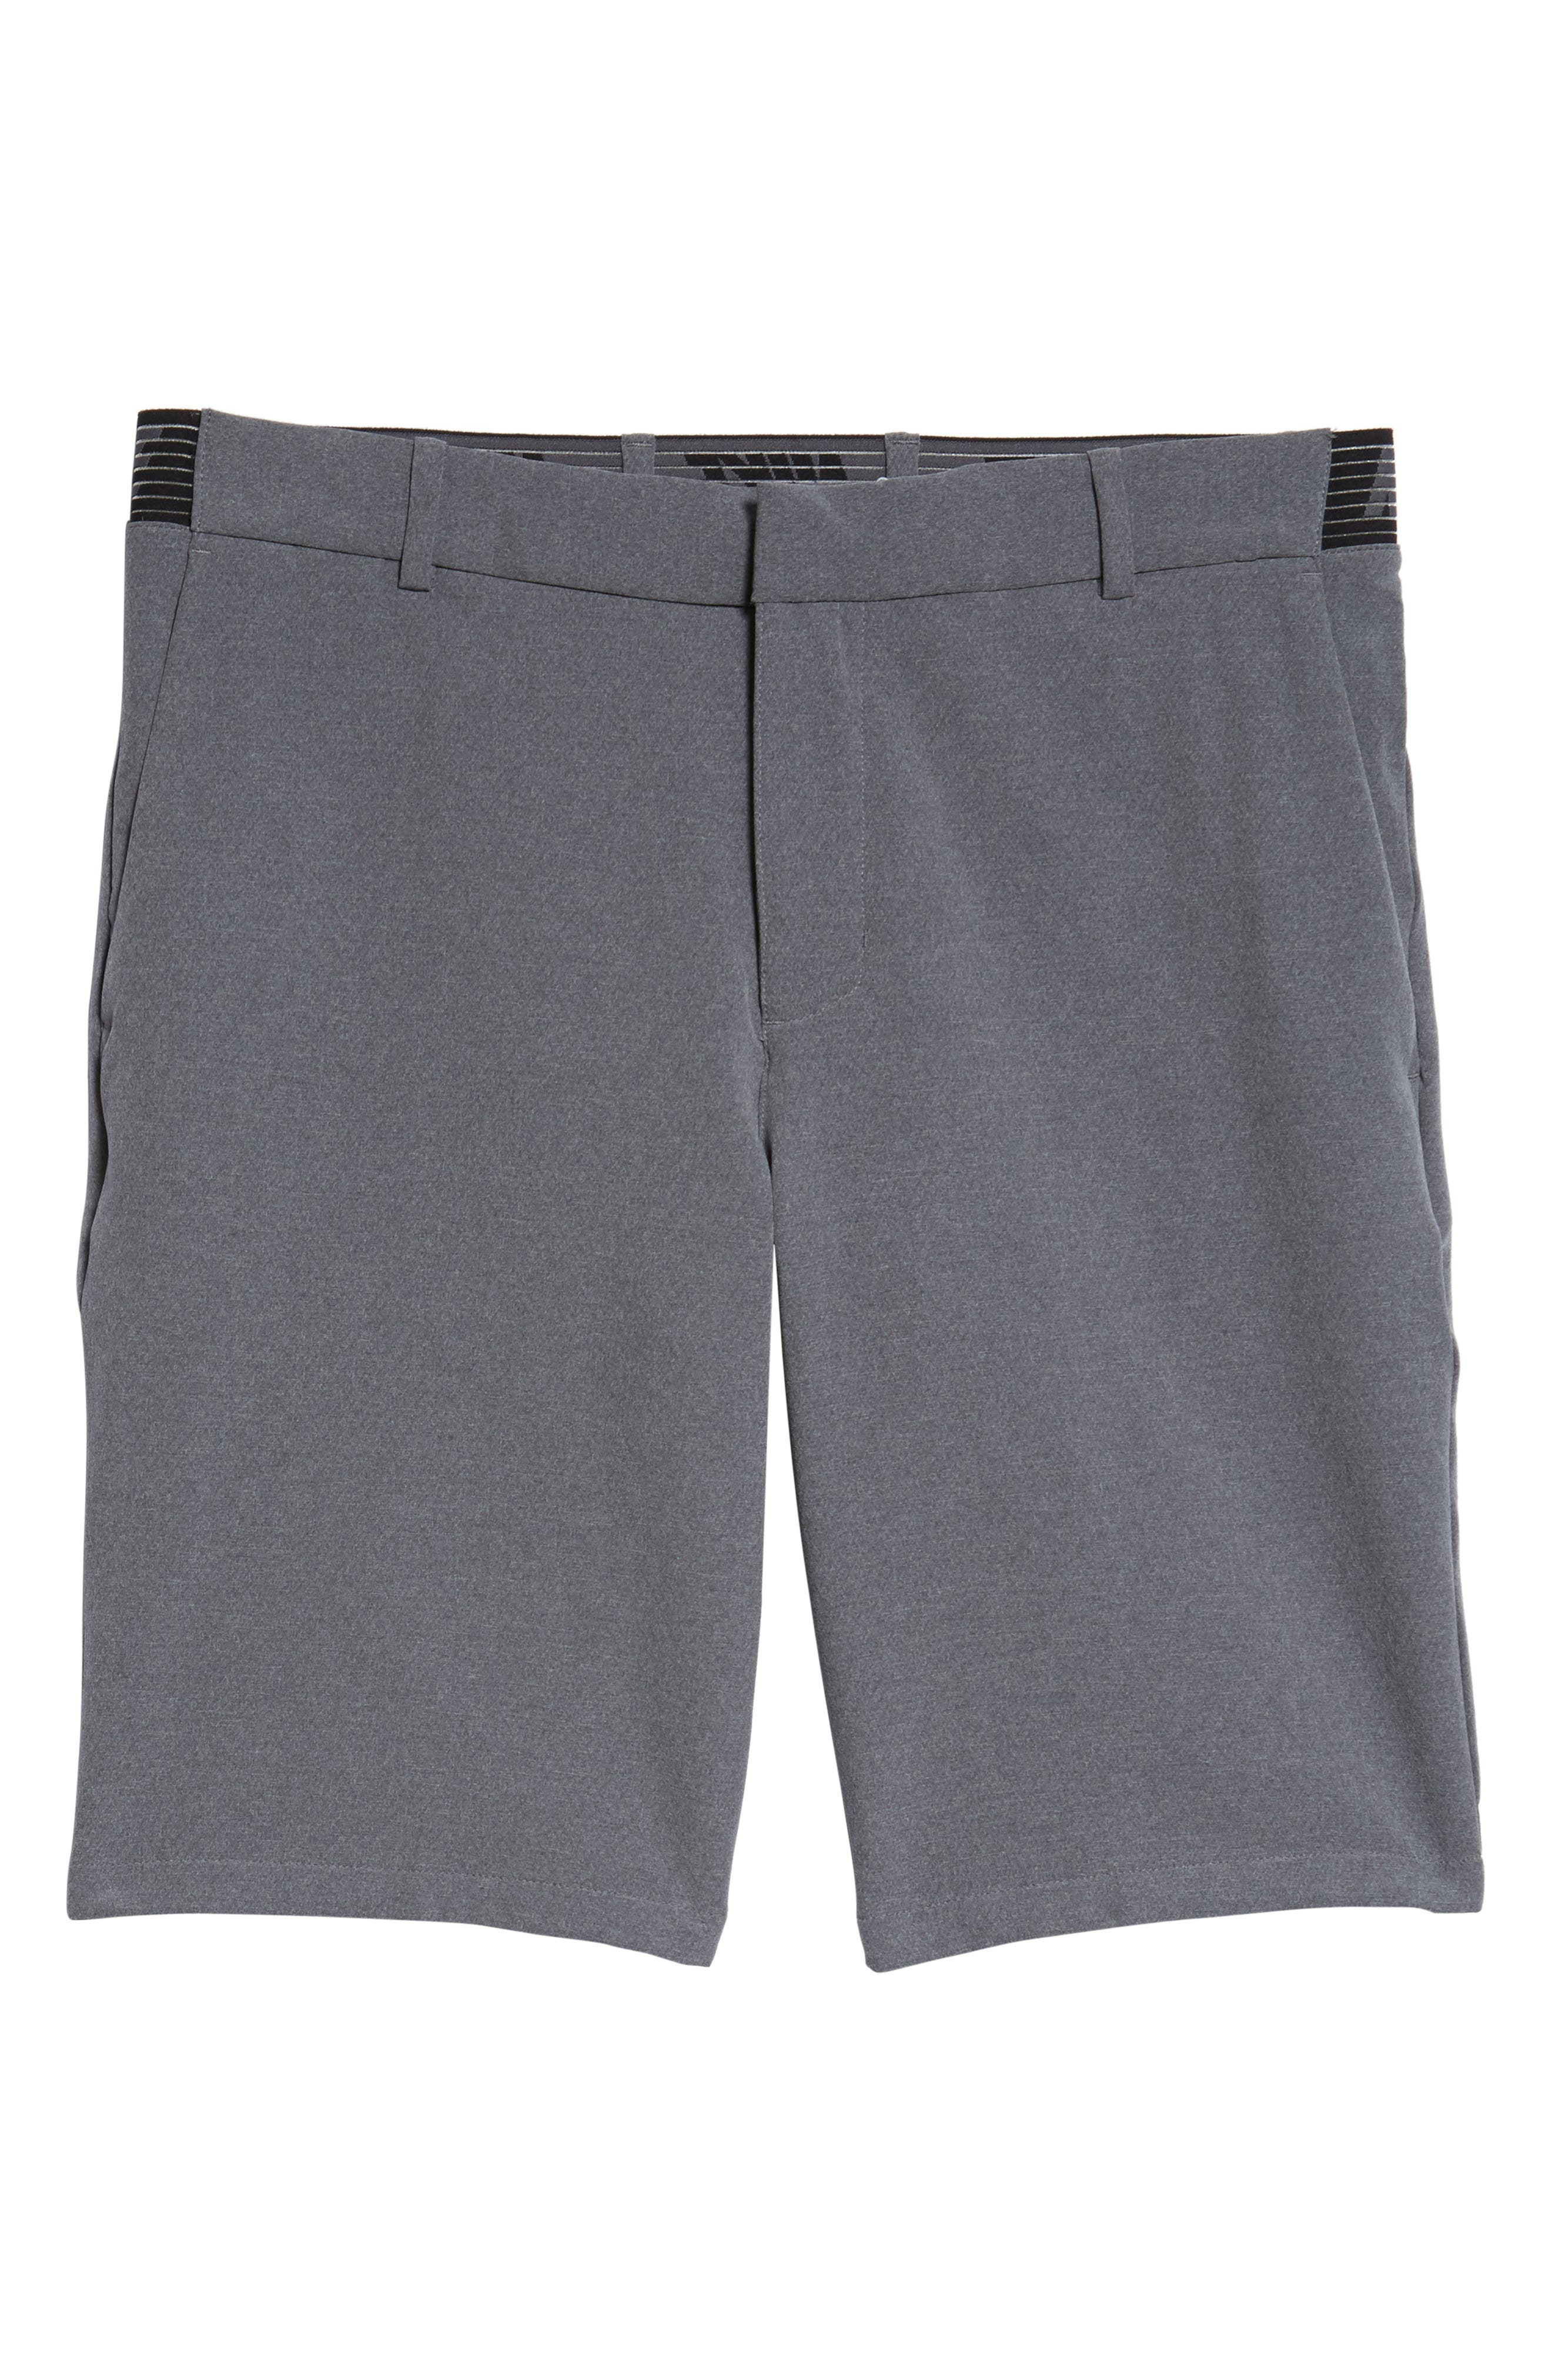 Dry Flex Slim Fit Golf Shorts,                             Alternate thumbnail 6, color,                             001